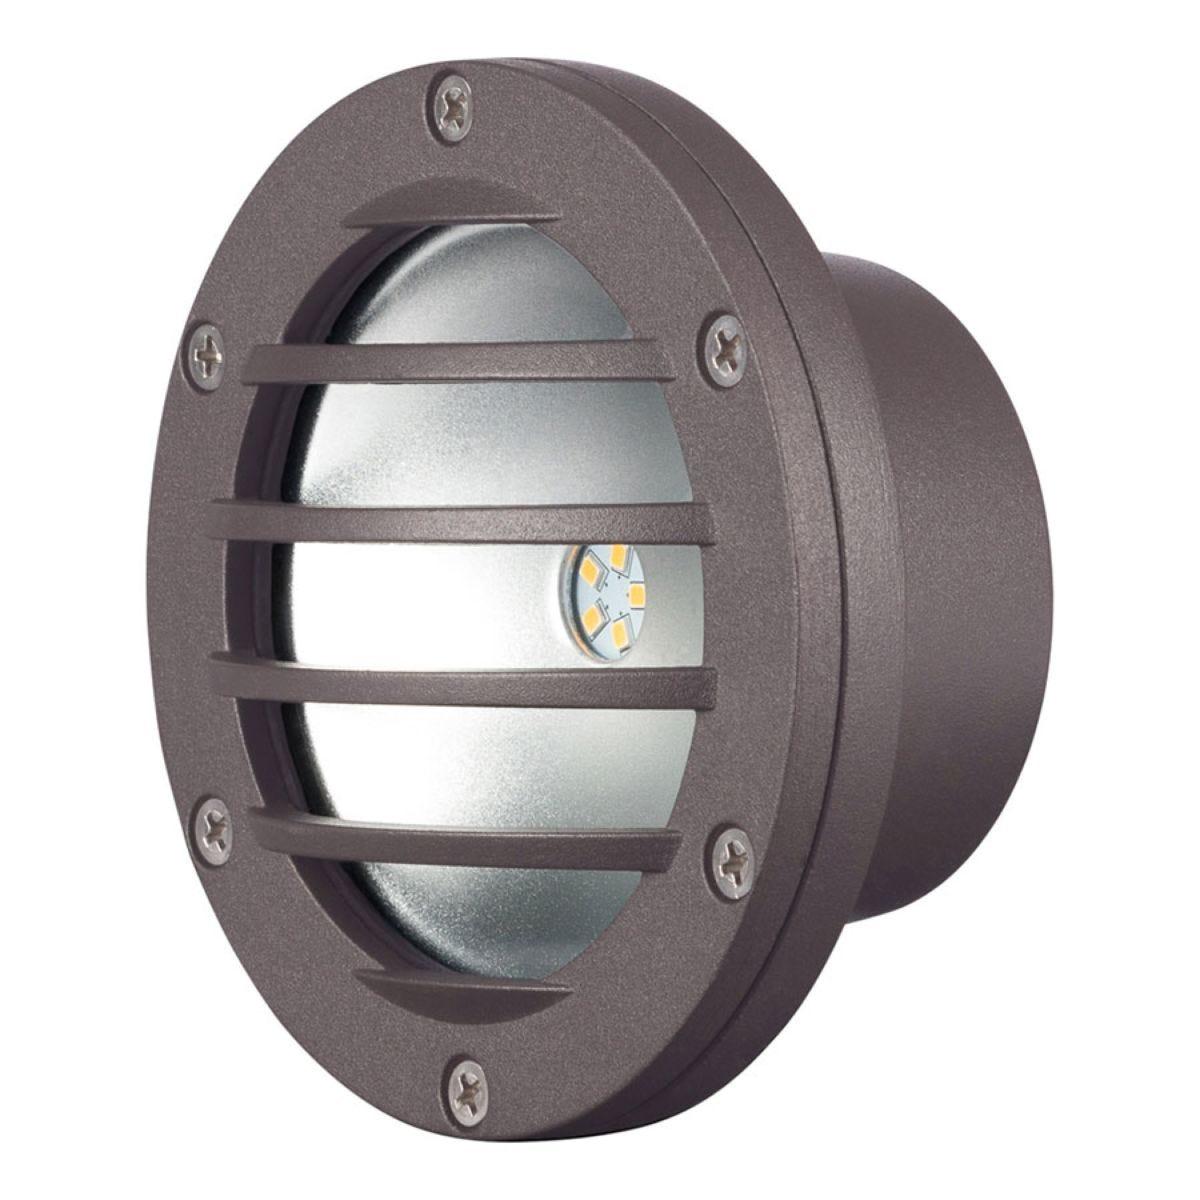 Duracell Lv201 Low Voltage Led Deck Lights 2 Pack Robert Dyas